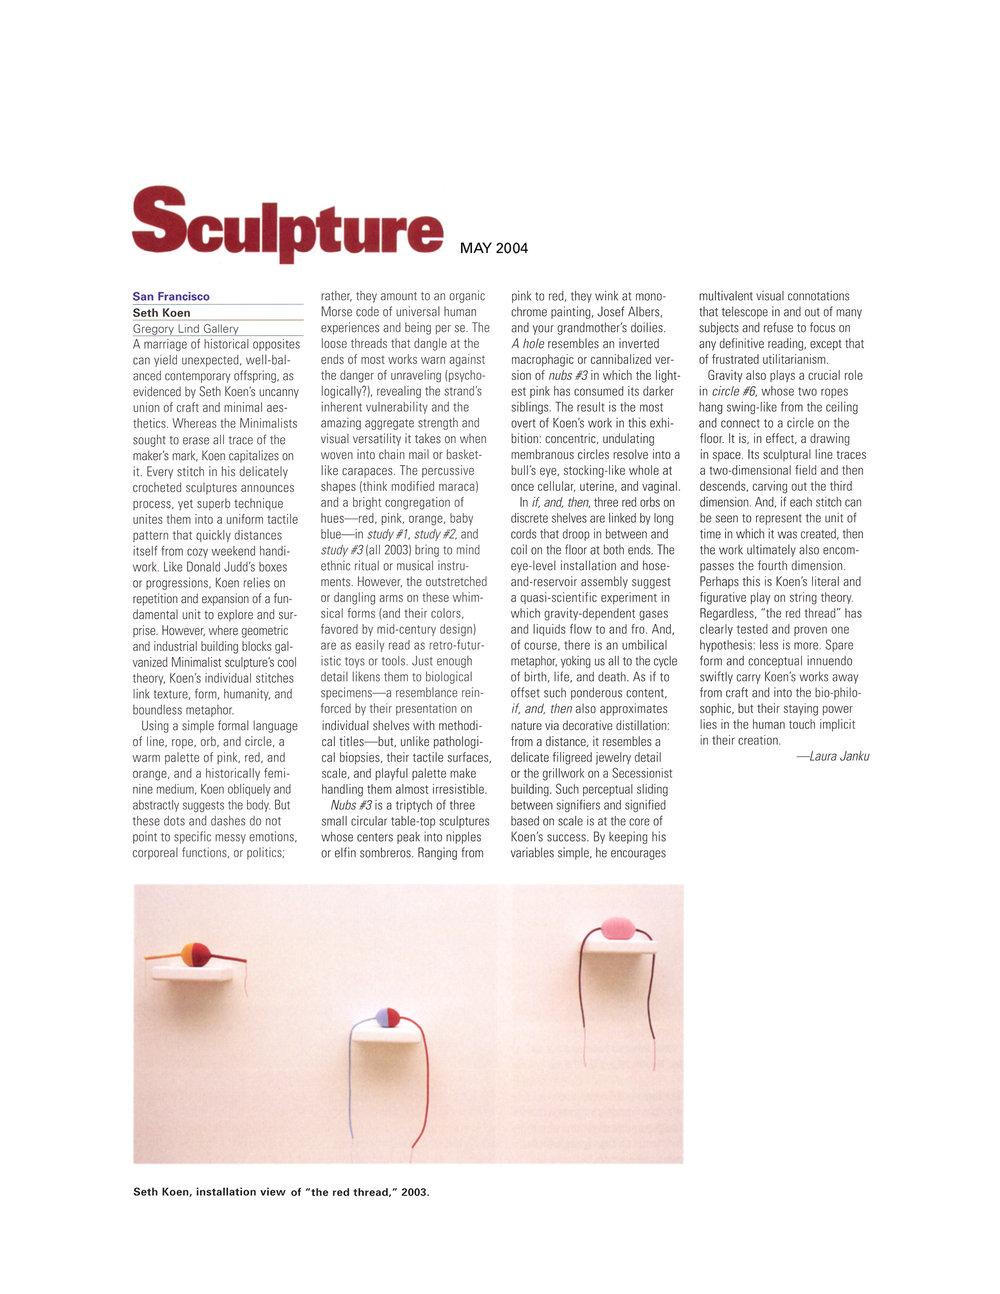 2004 sculpture_koen.jpg